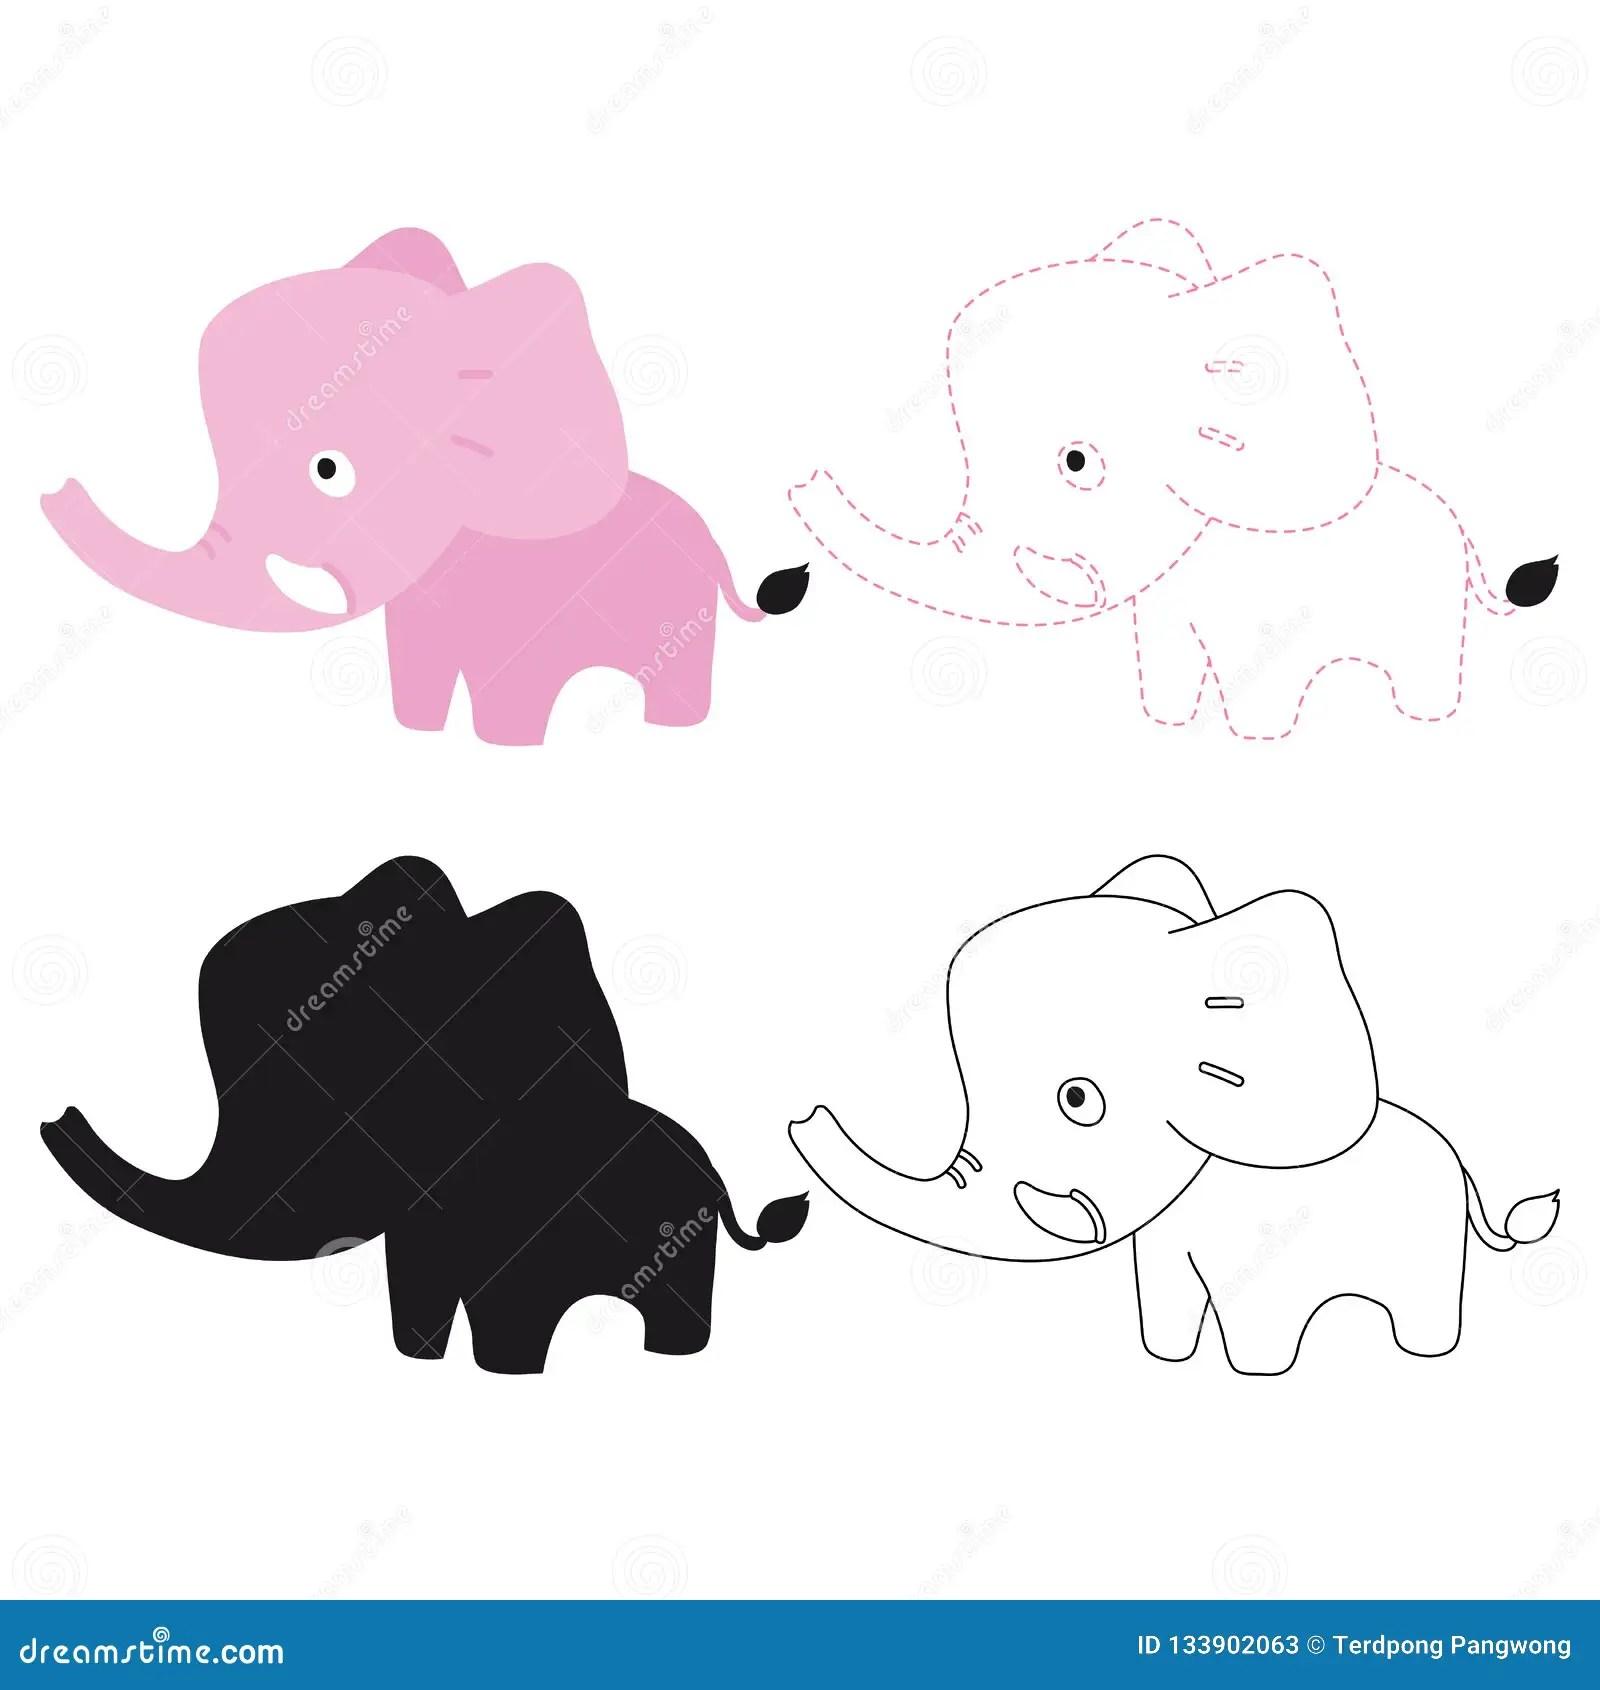 Elephant Worksheet Vector Design Stock Vector